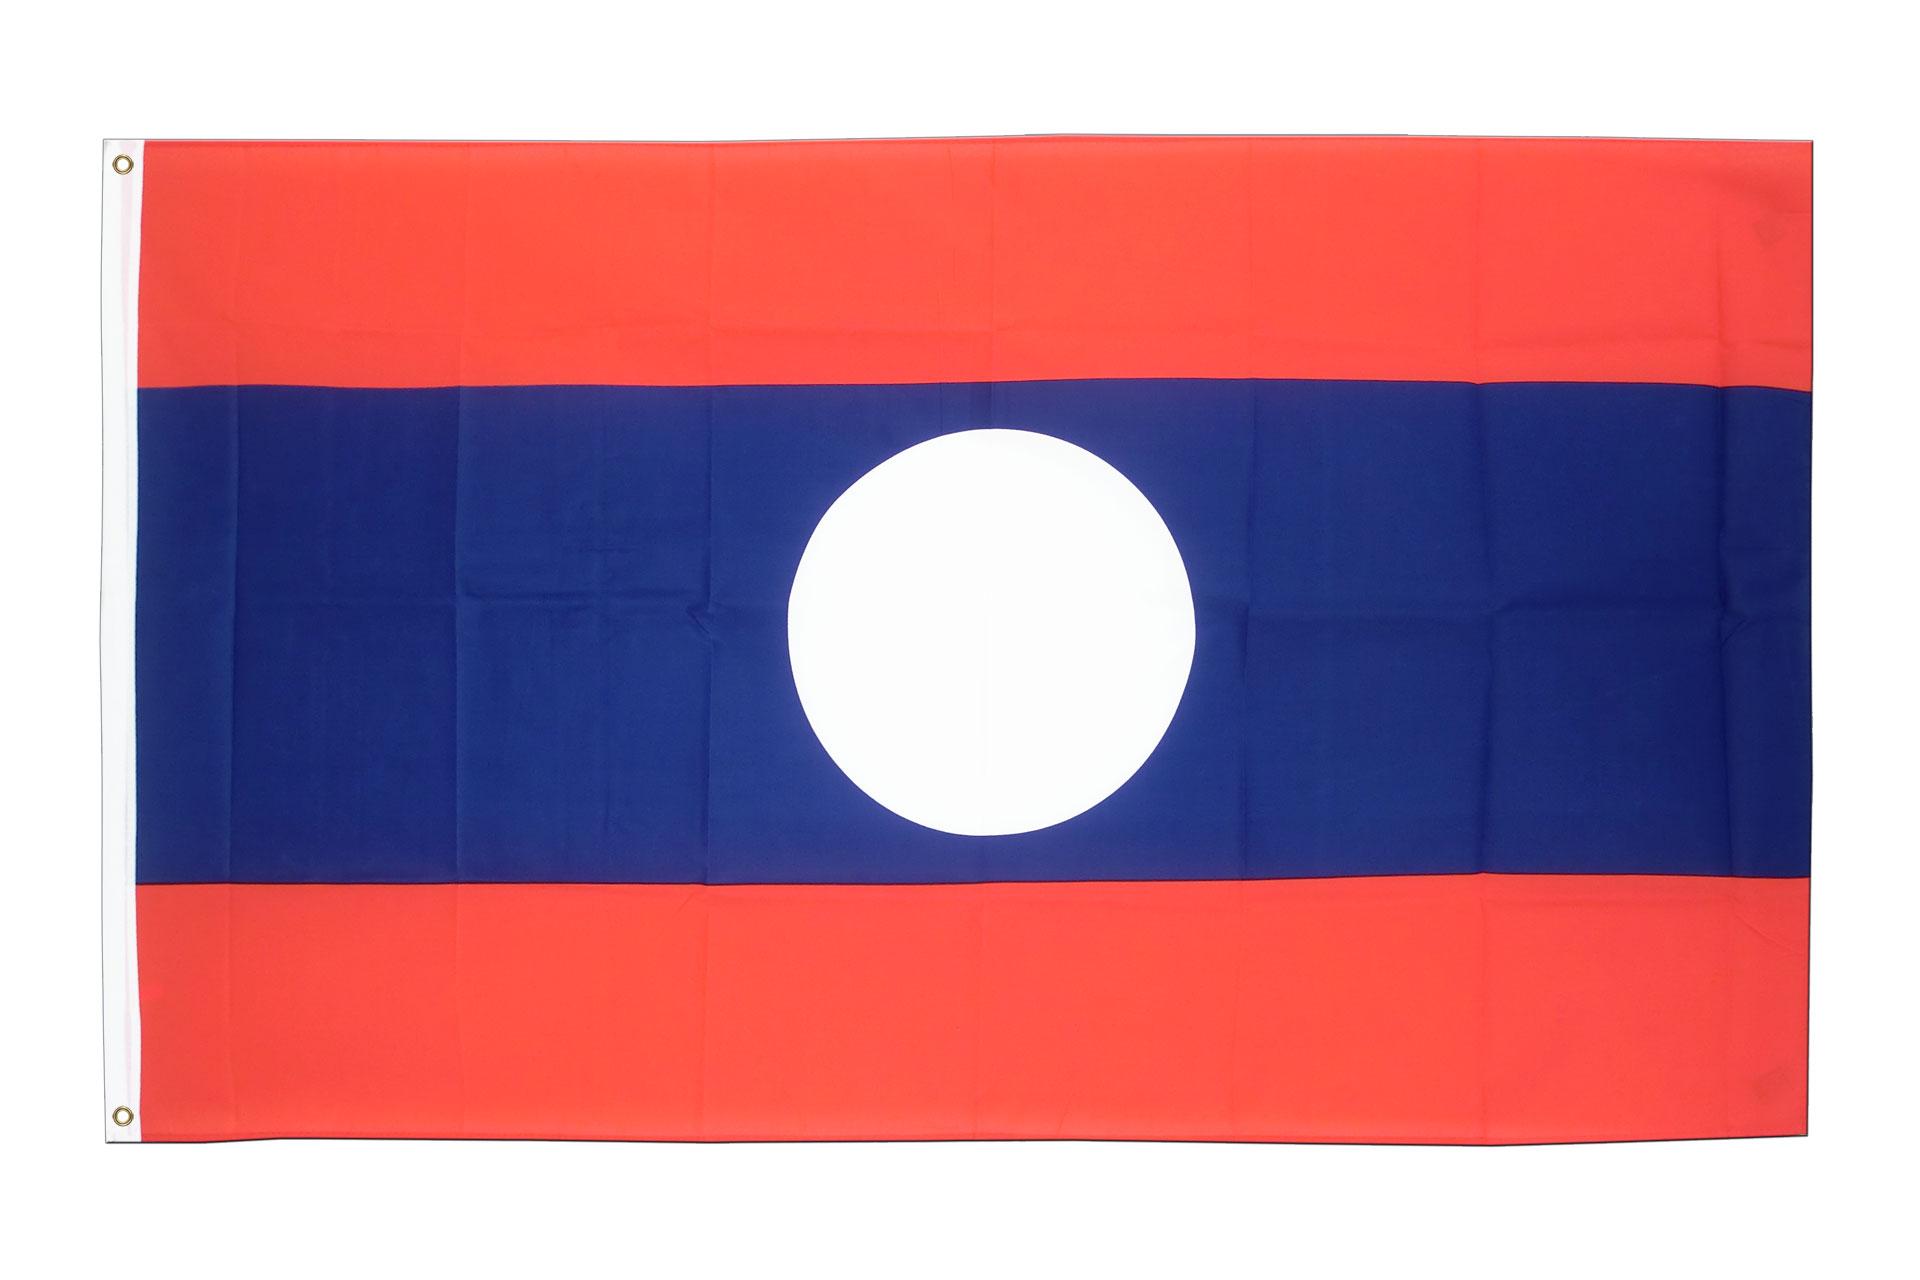 90 x 150 cm Fahnen Flagge Schaumburg Lippe Neu